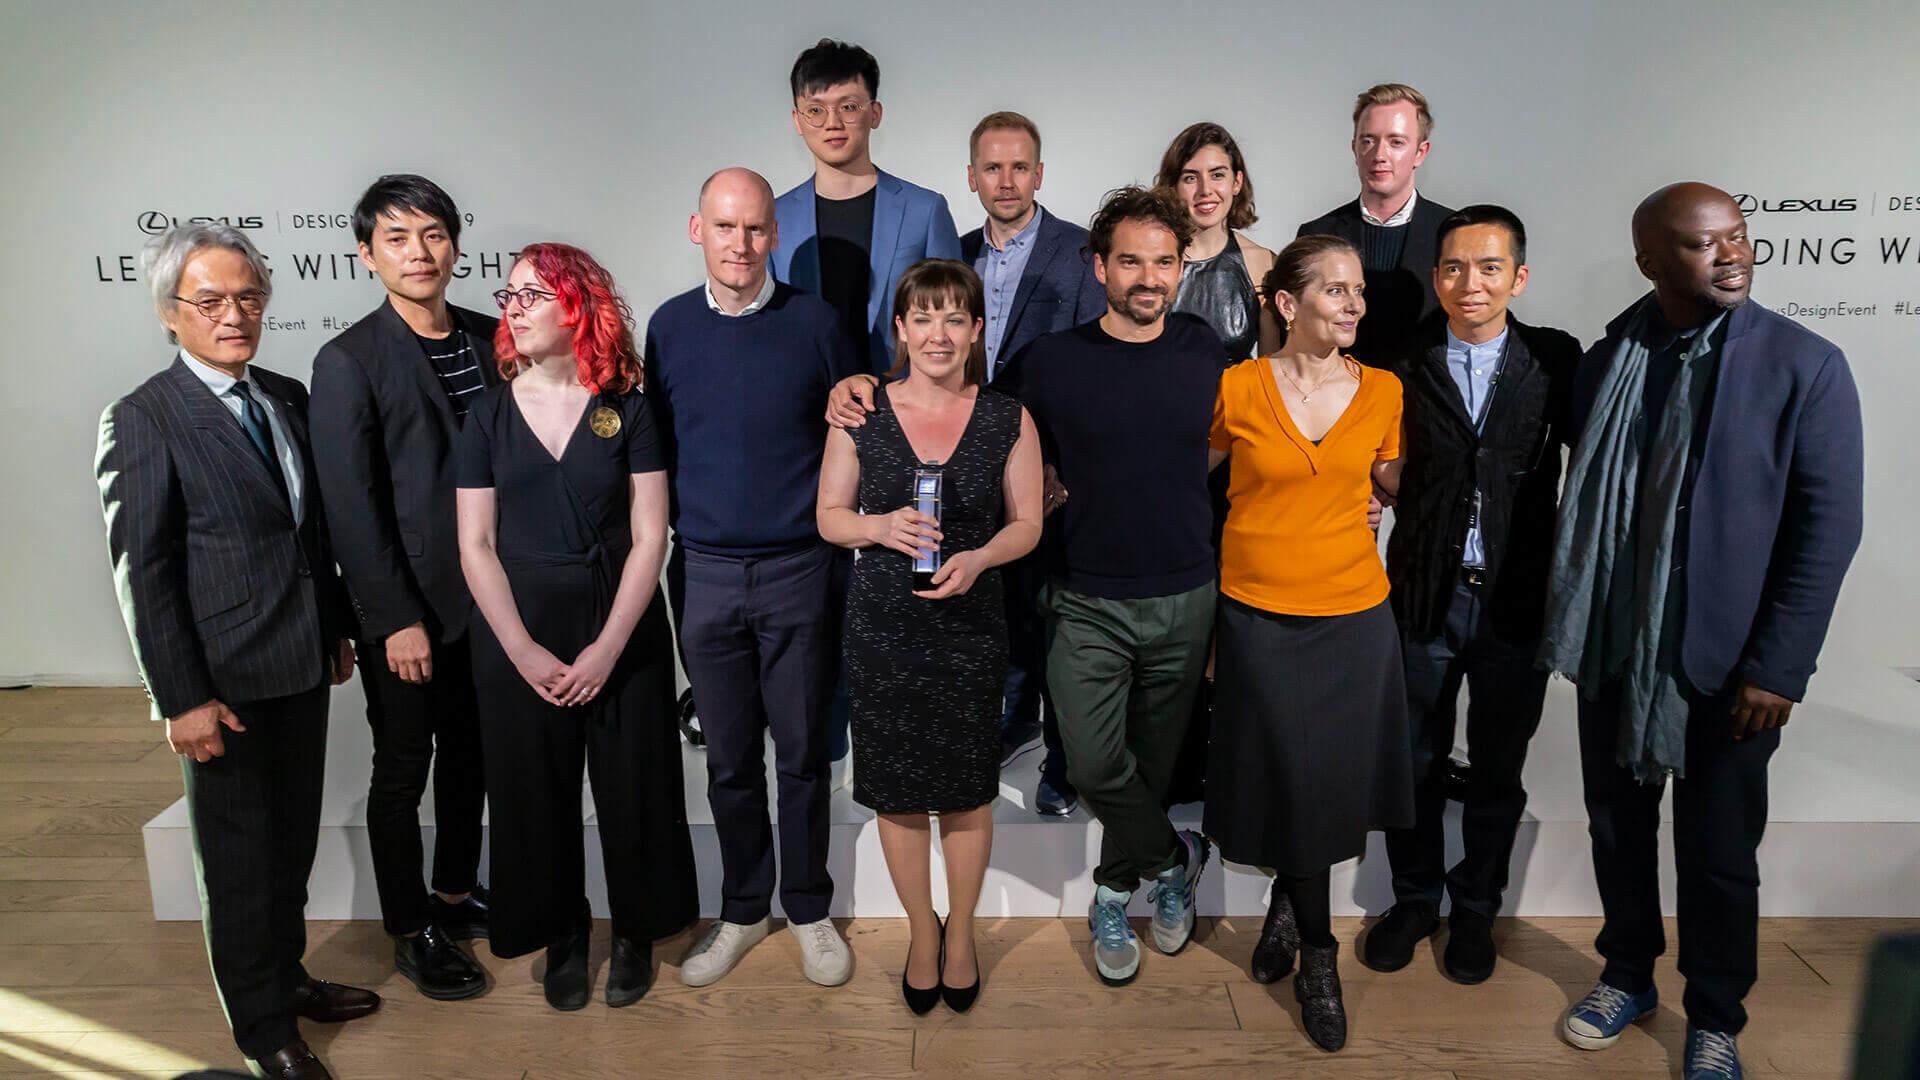 2019 lexus design awards hero